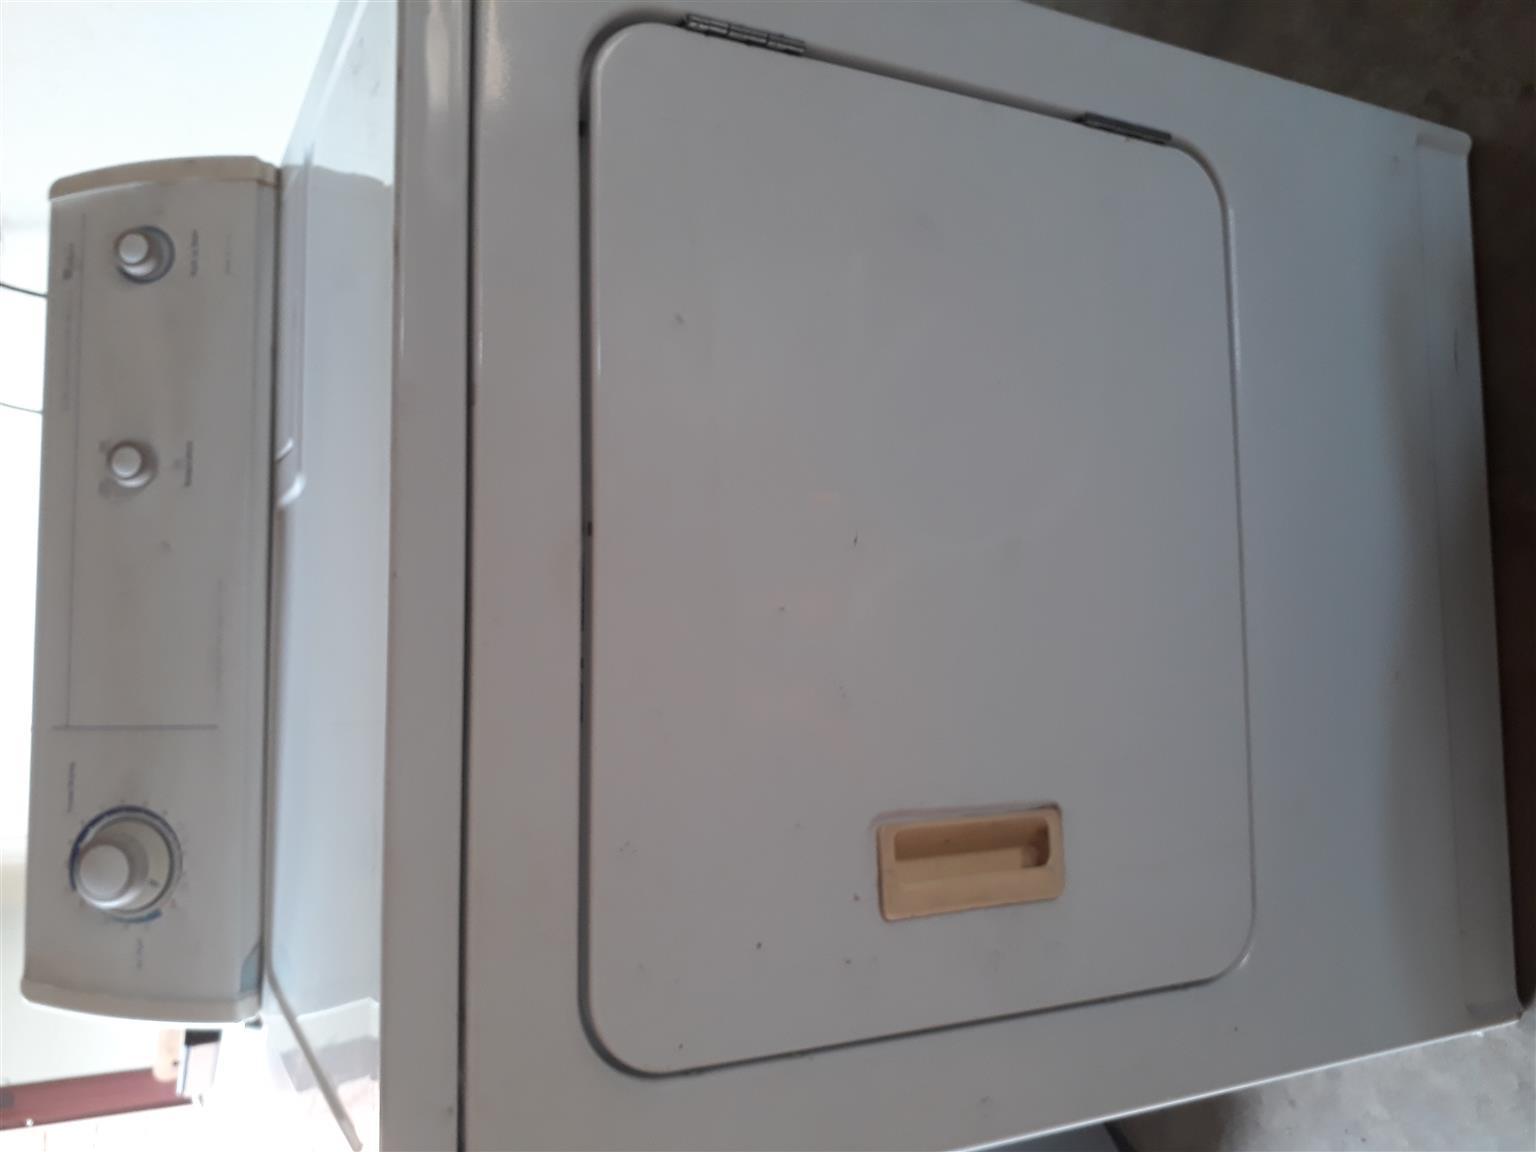 Tumble dryer -Whirlpool